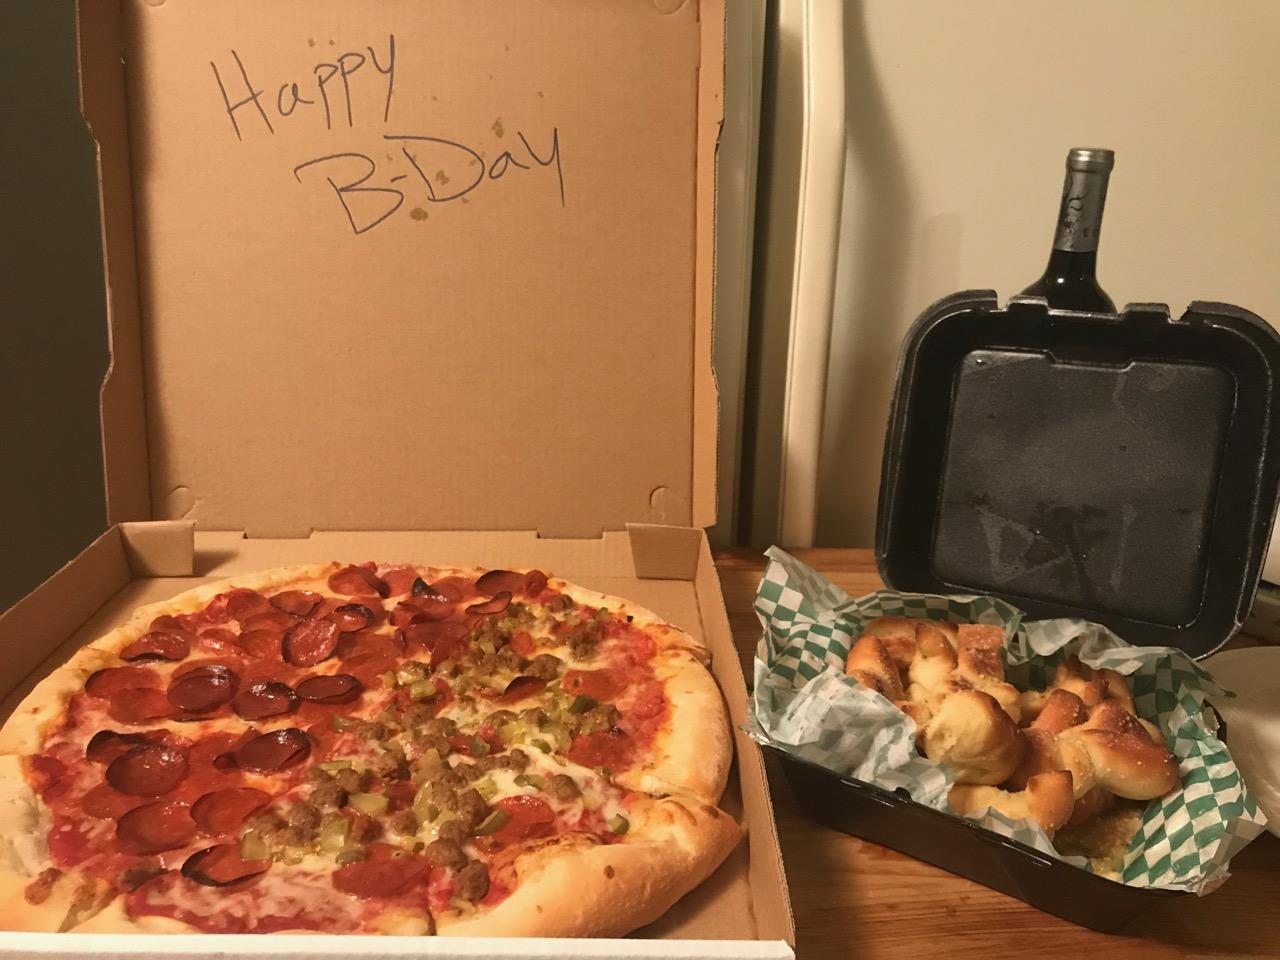 The Best Birthday Dinner Ever – December 27th 2017